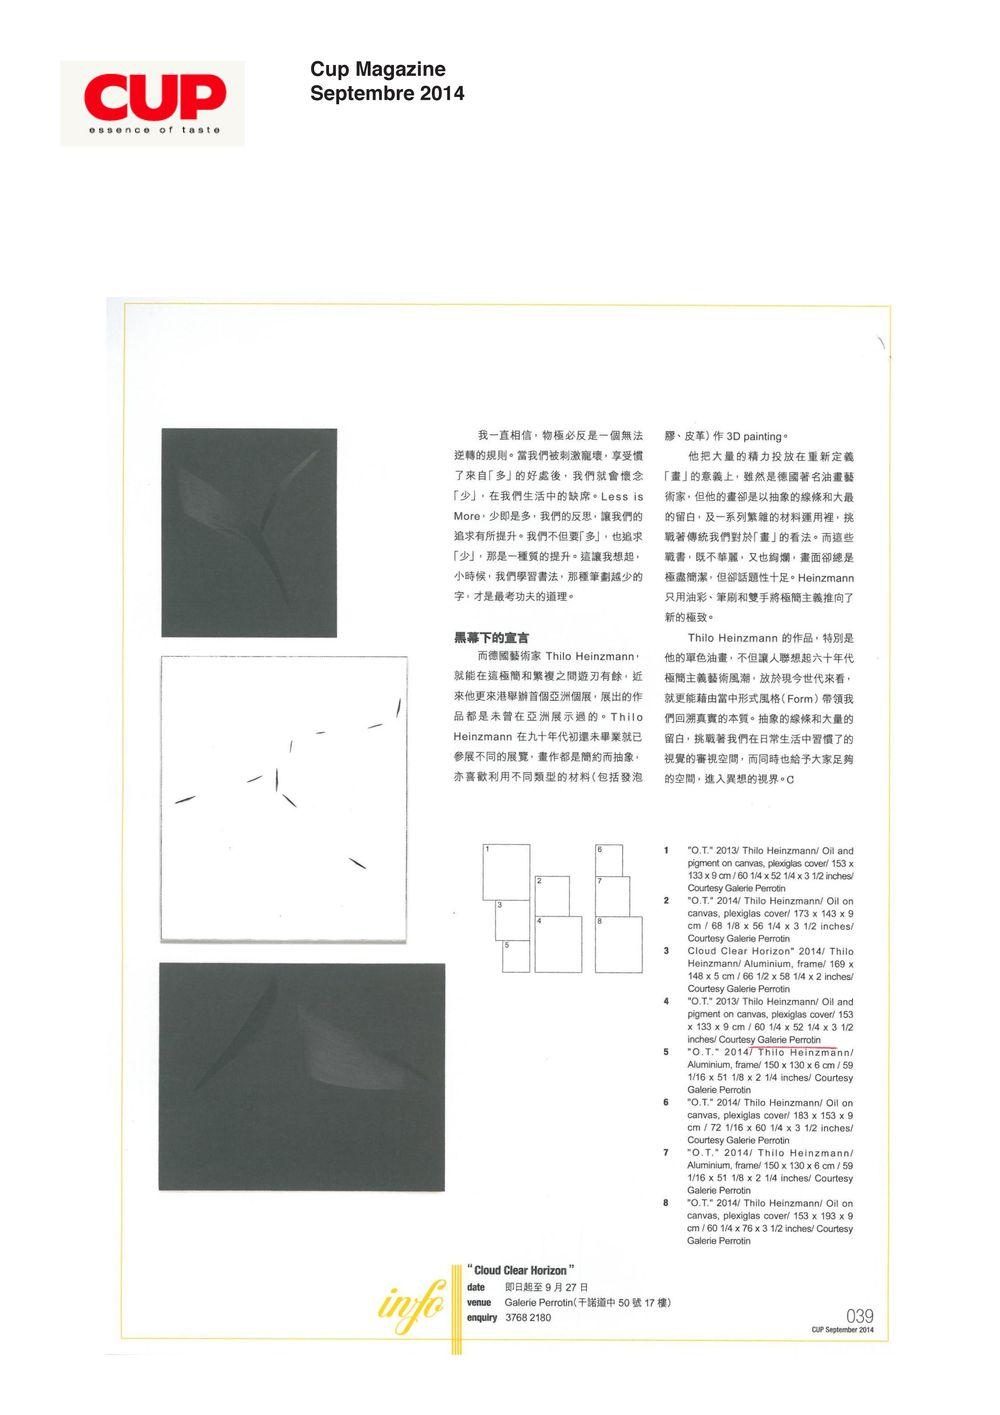 CUP Magazine | 席洛·漢茲曼